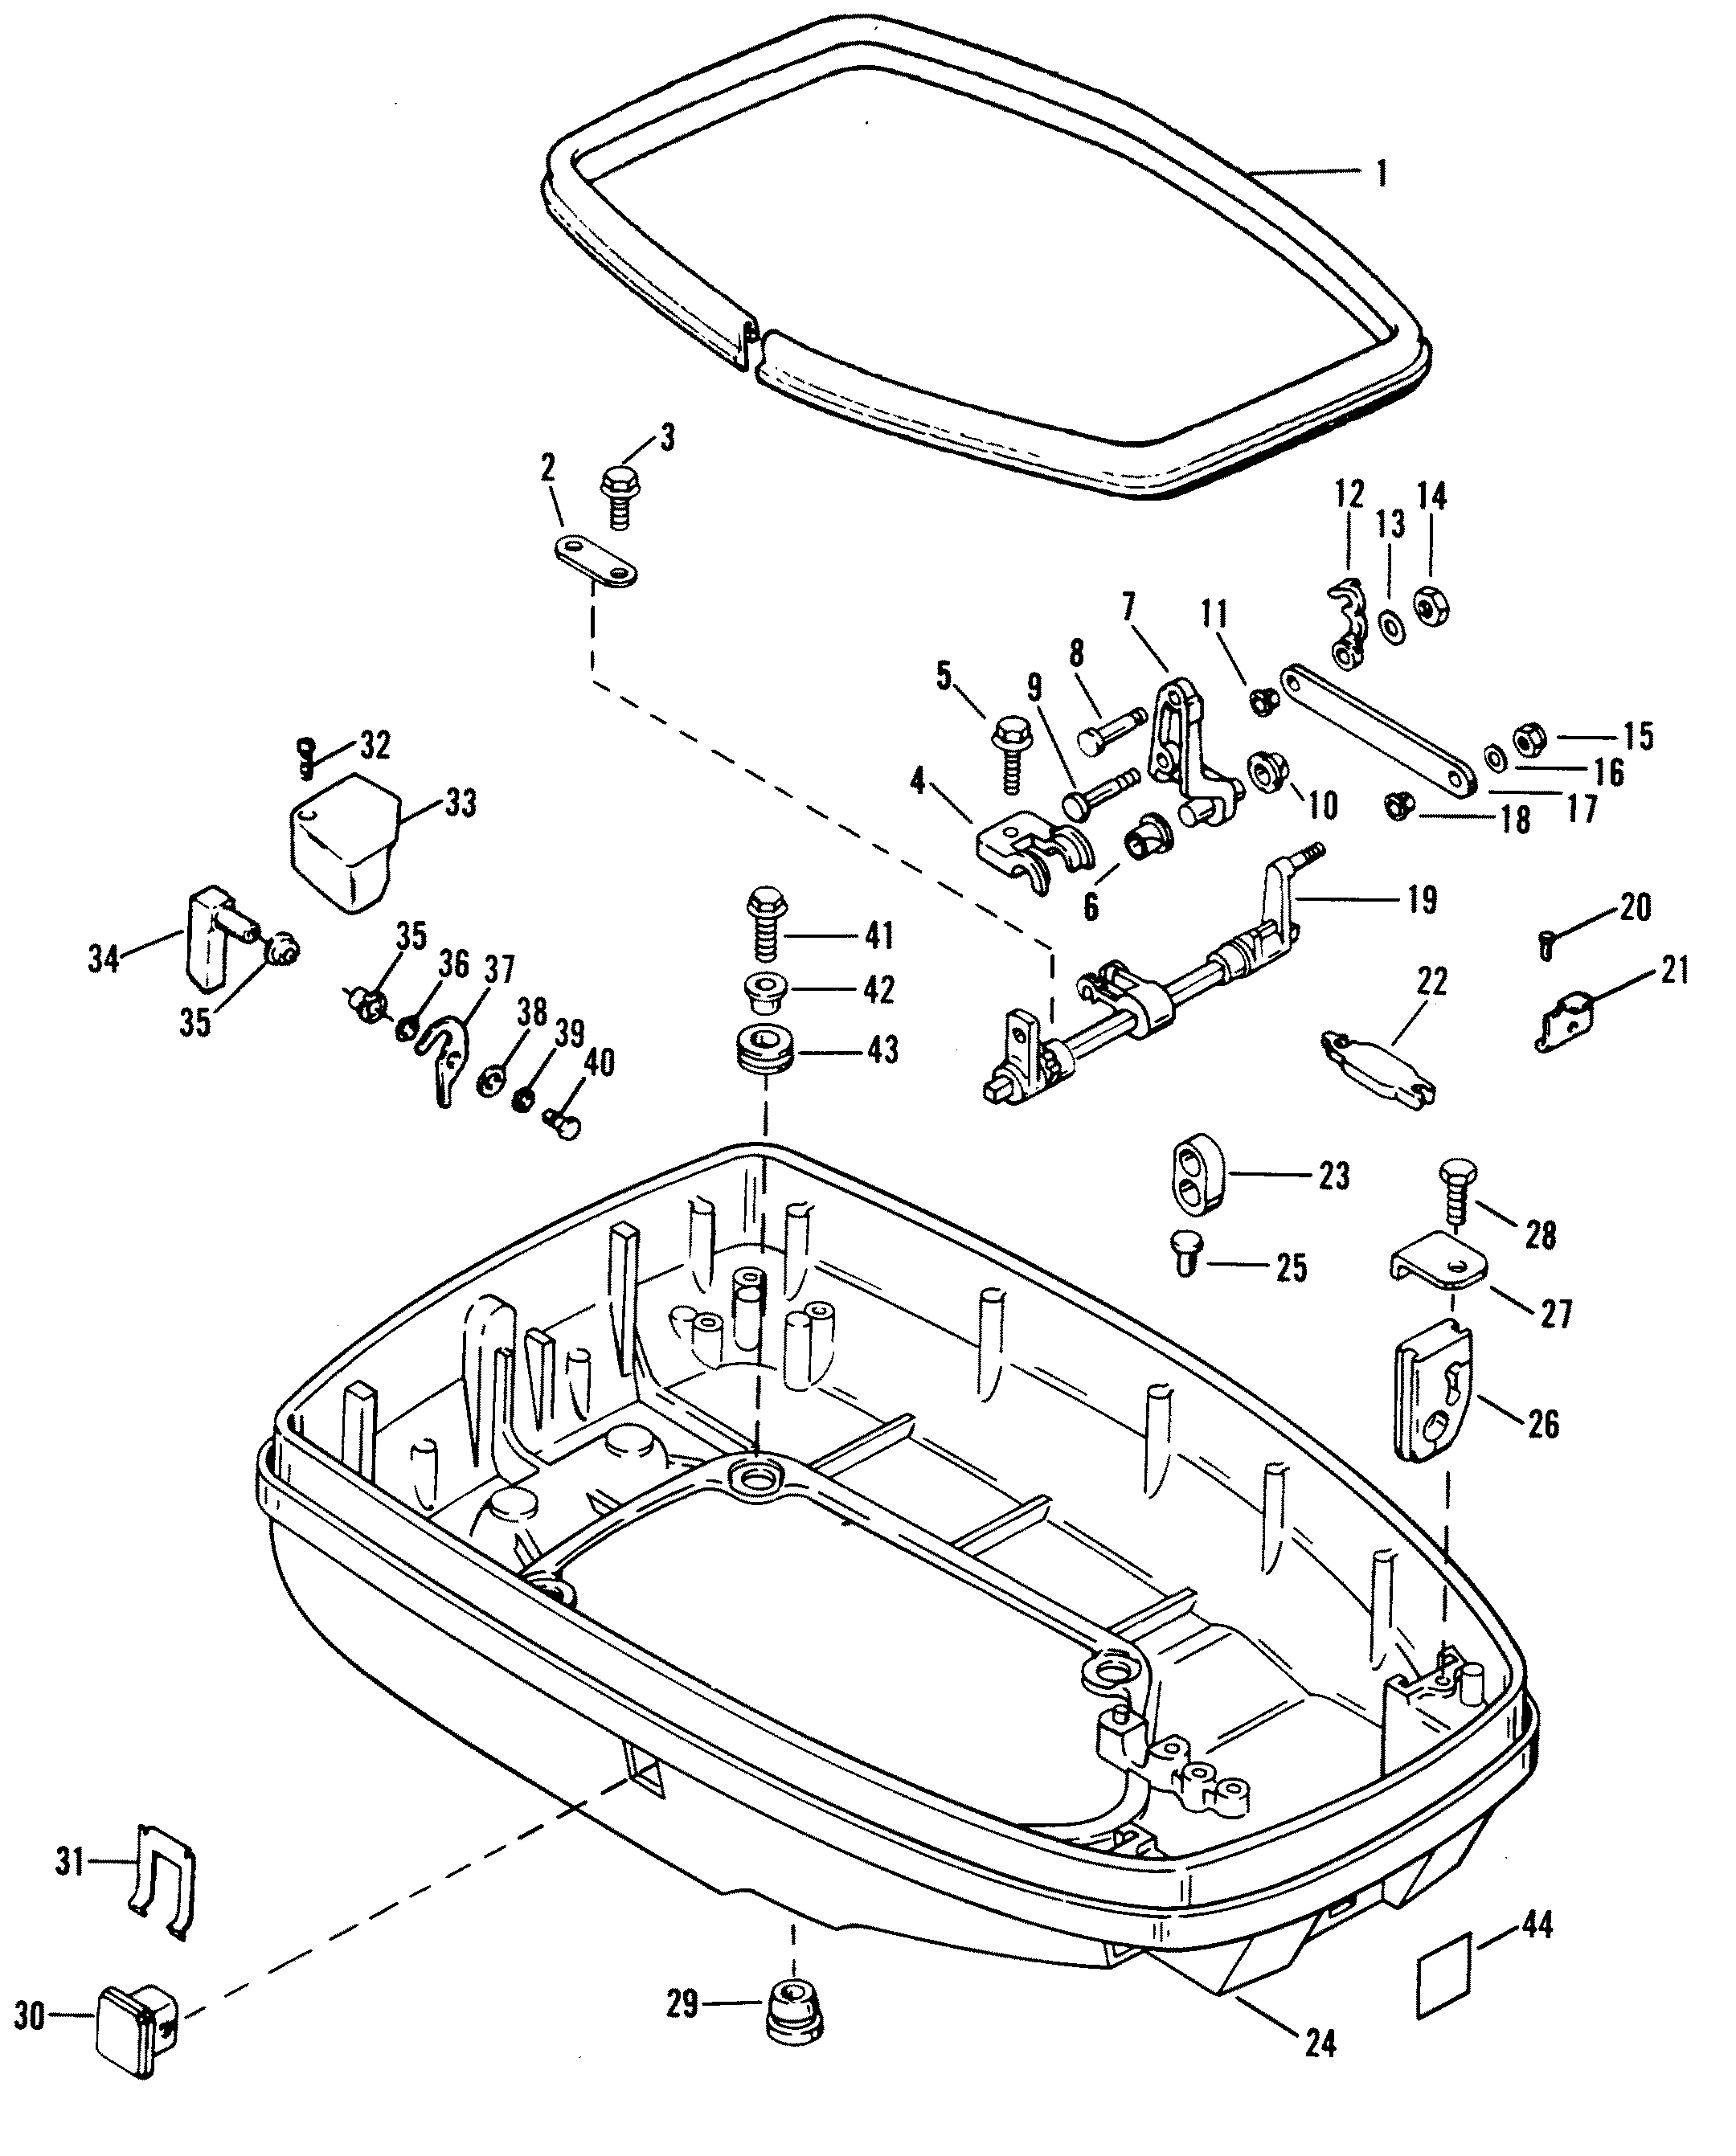 1995 40 Hp Mercury Outboard Schematic Trusted Schematics Diagram 115 Wiring Force H P 0e093700 Thru 0e138599 Bottom